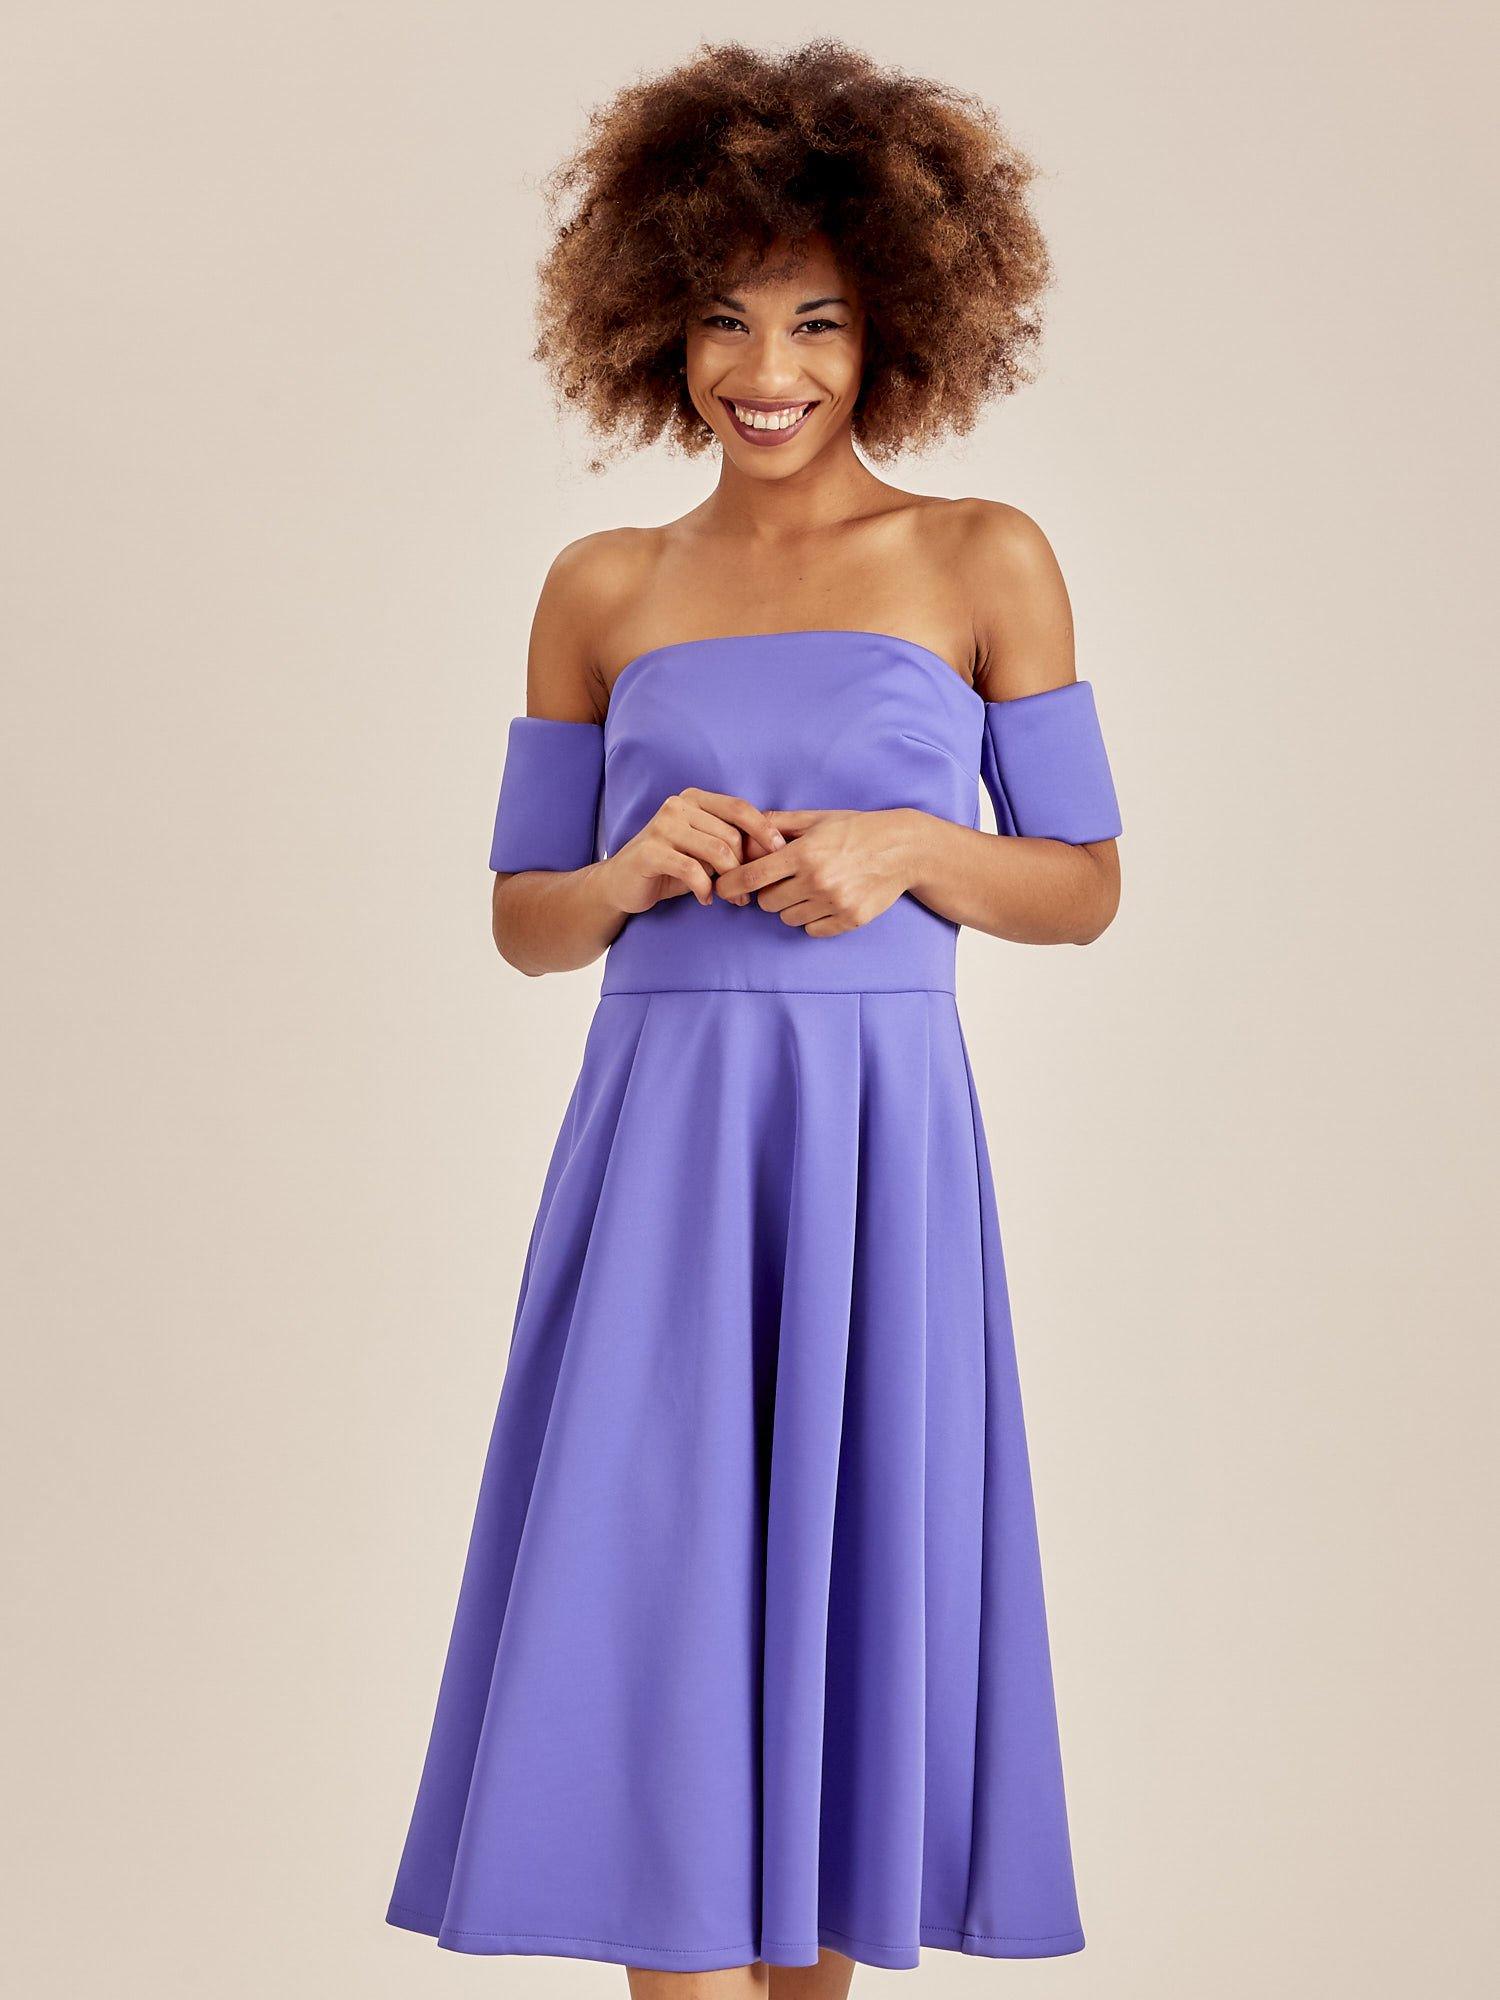 4a4cde77e4 Odcinana sukienka koktajlowa off shoulder niebieska - Sukienka ...